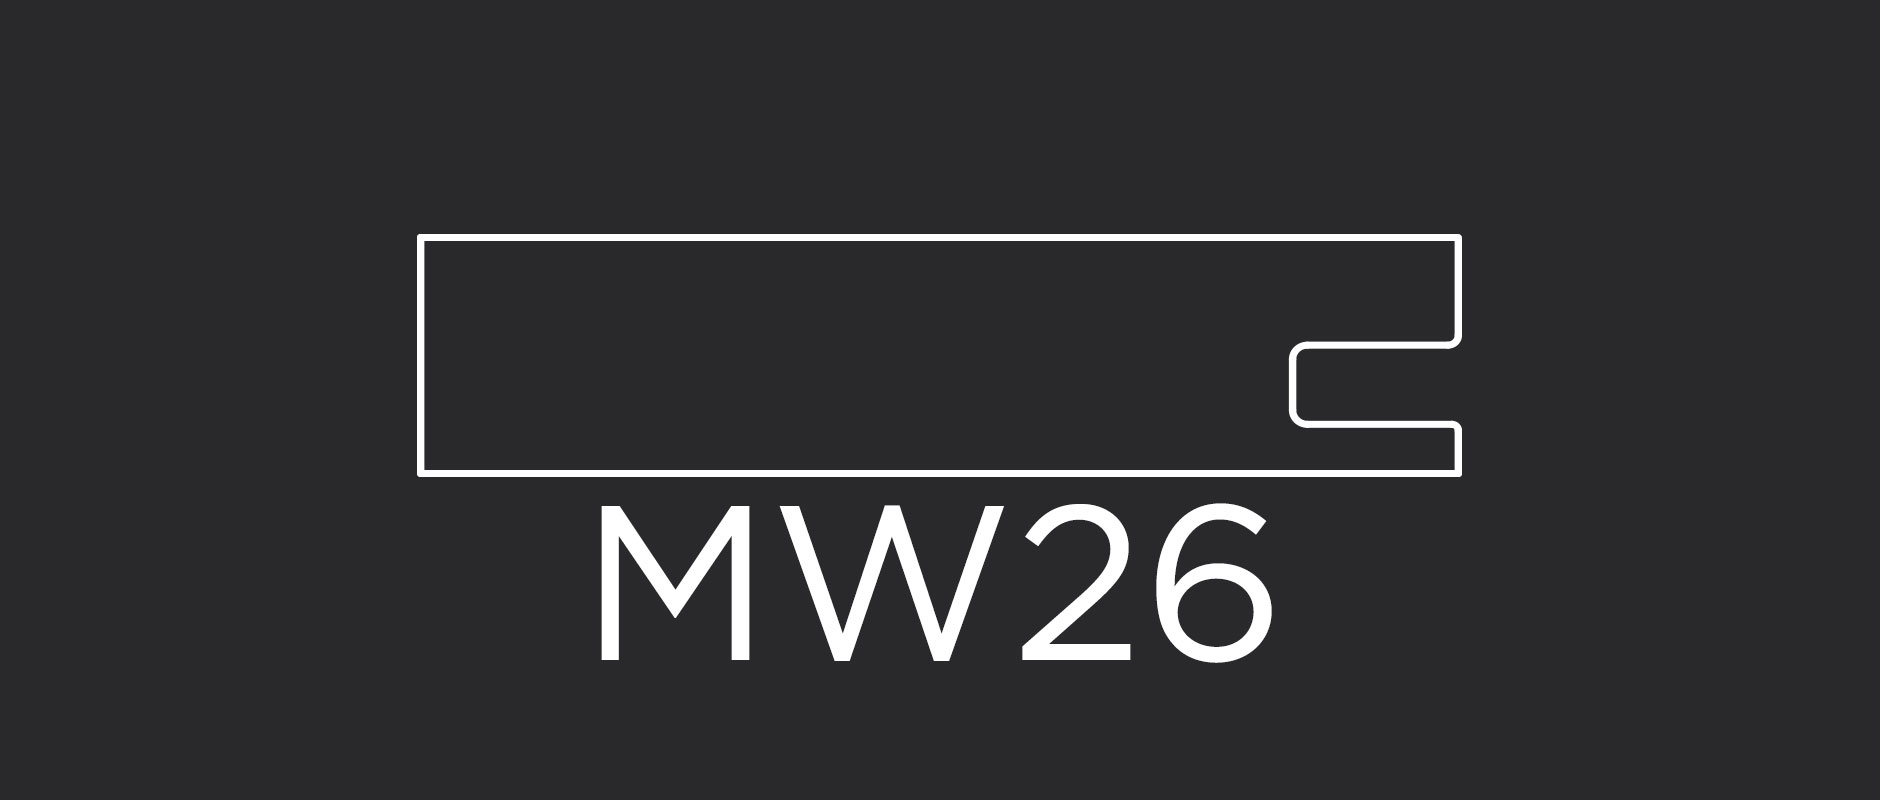 "MW26 mitered frame 3-1/8"" wide"